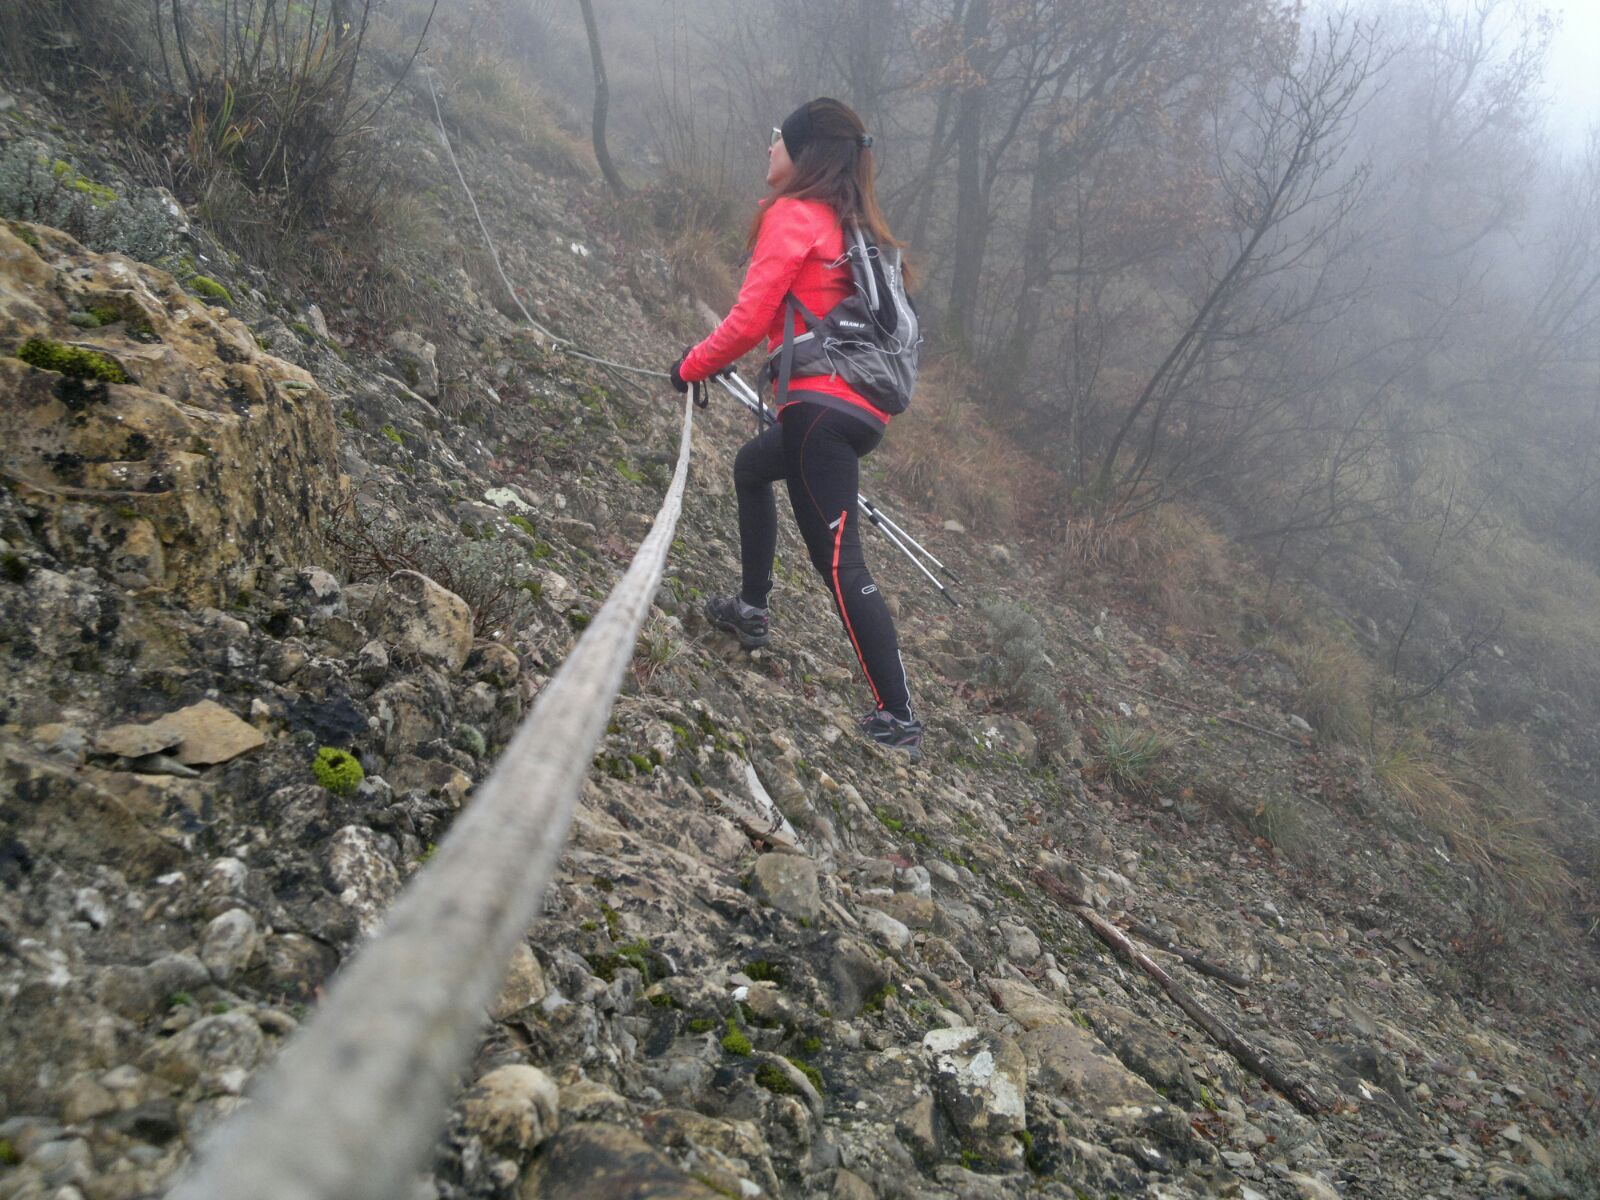 La Croce degli Alpini - Trekking Inside